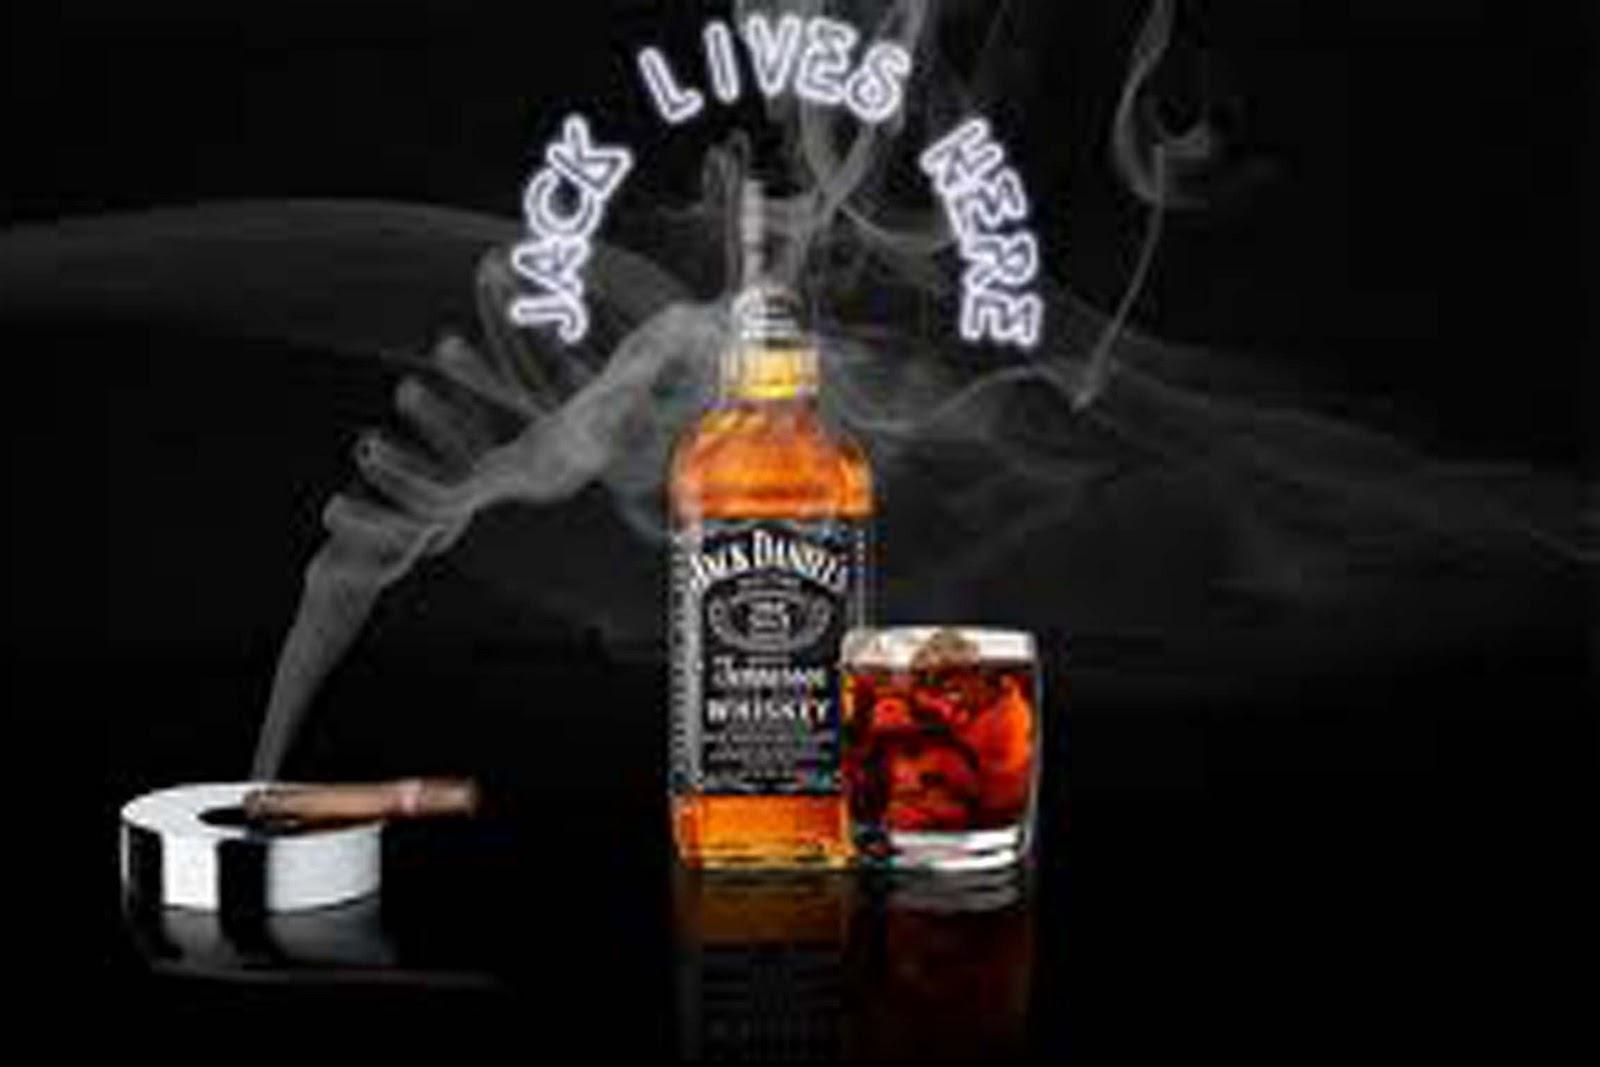 http://3.bp.blogspot.com/-J3_2yHYAeVU/TZi4z5fp5bI/AAAAAAAAAb0/lMIp-OURQWM/s1600/cartel_Jack_Danies_whiskey_puro.jpg